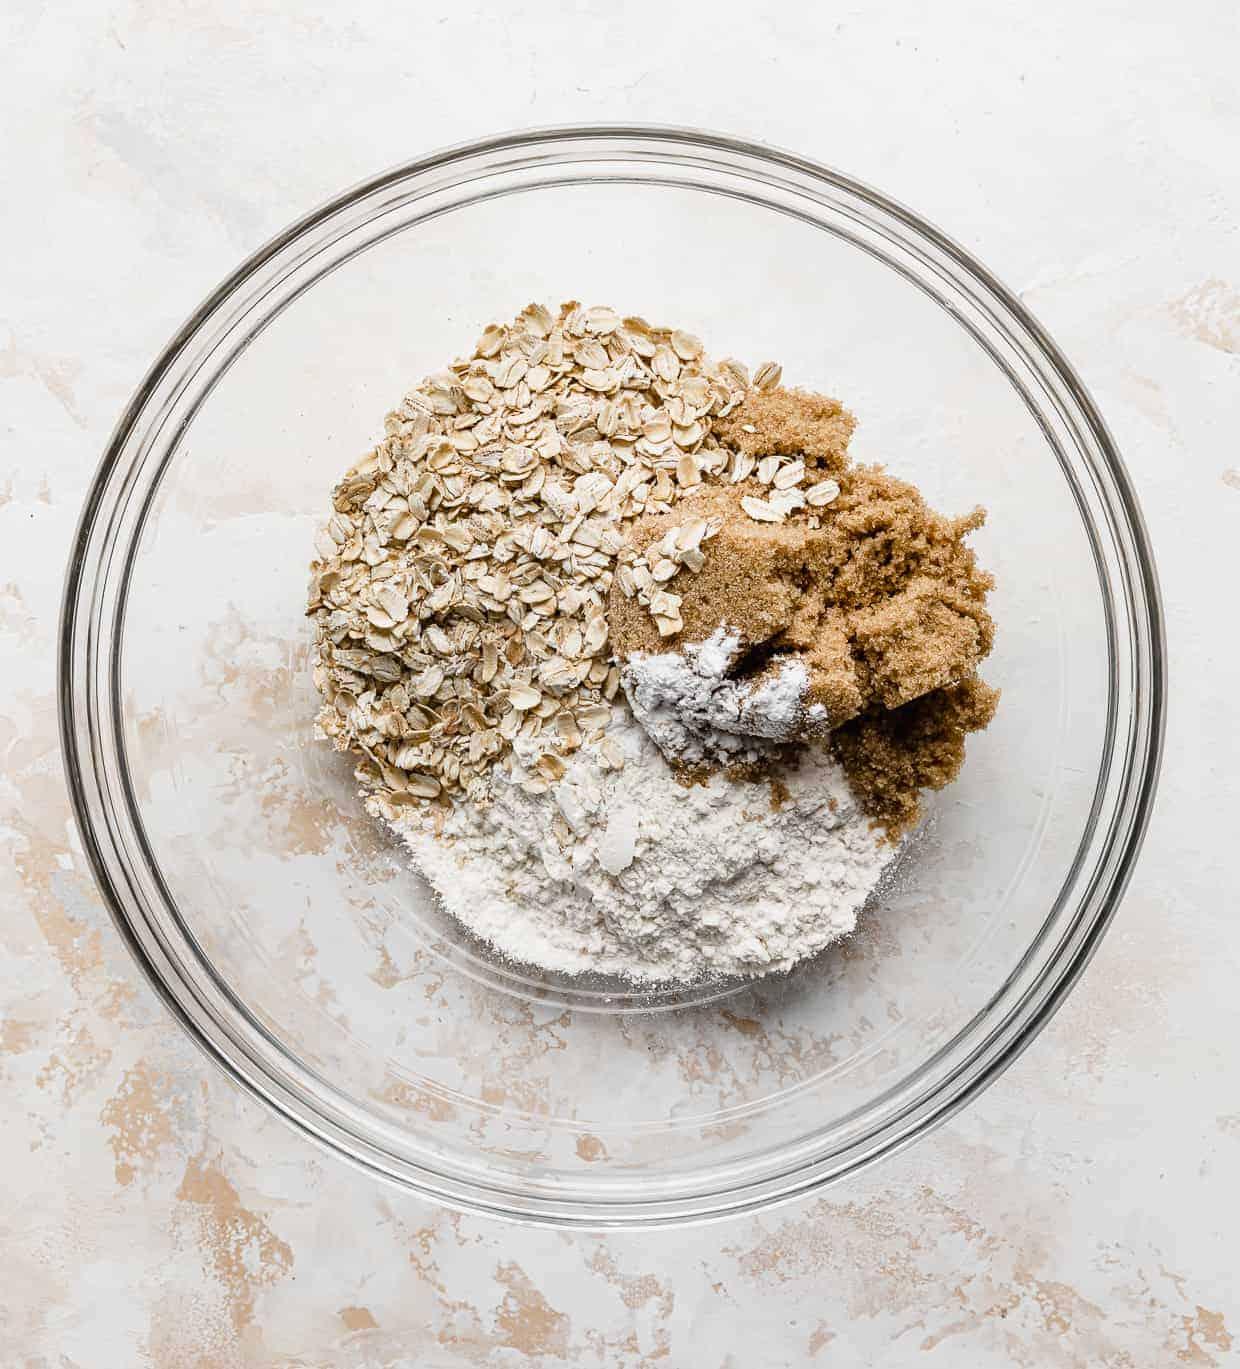 Oats, brown sugar, cinnamon, and flour in a glass bowl.